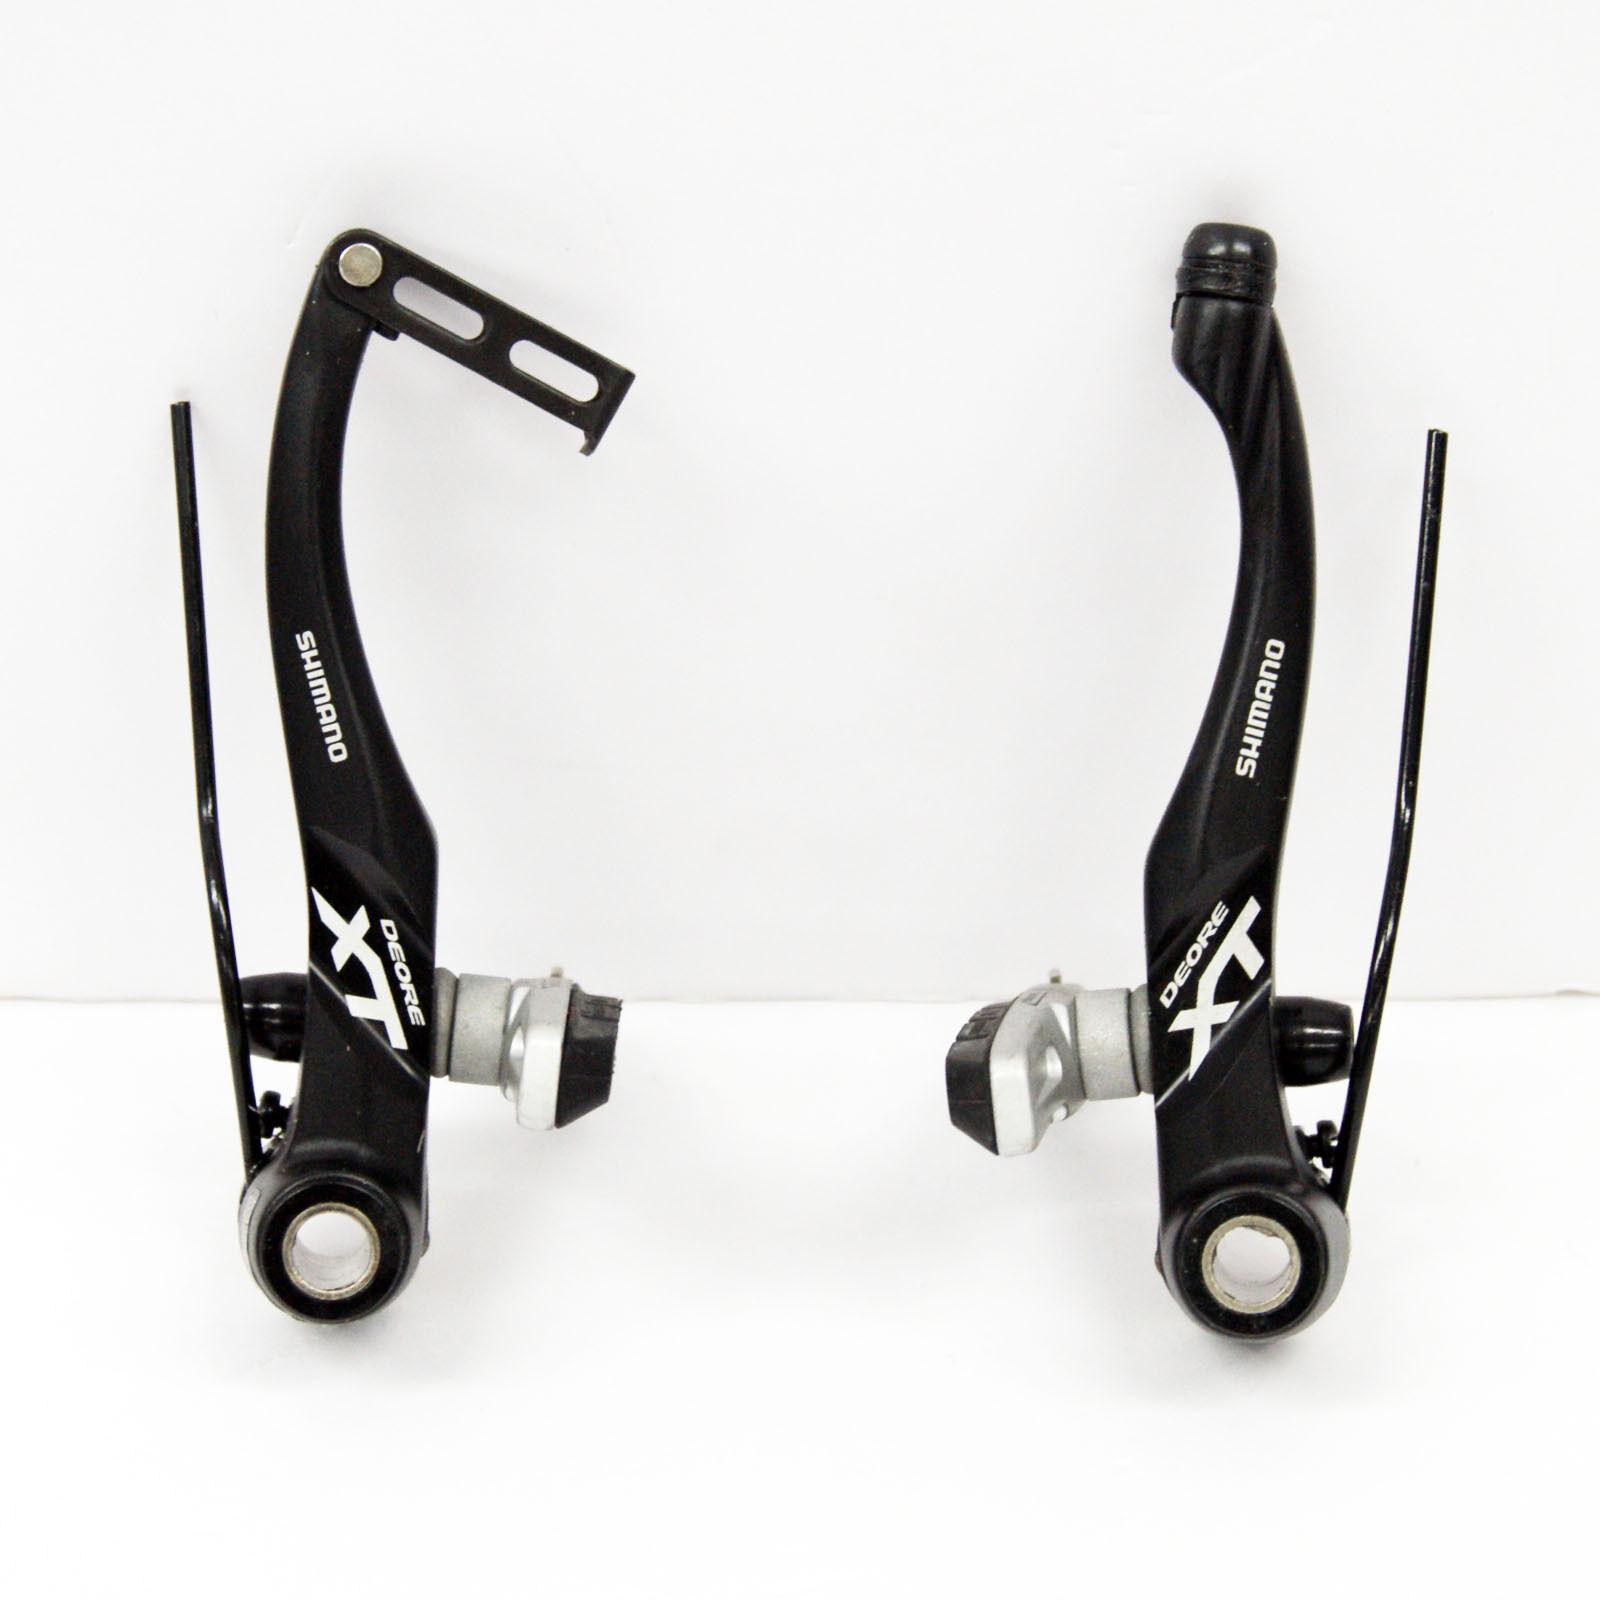 Shimano Shimano Shimano Deore XT Br-T780 Schwarz V Brems für Vorne Ebrt780fx22spl 2f8c3b